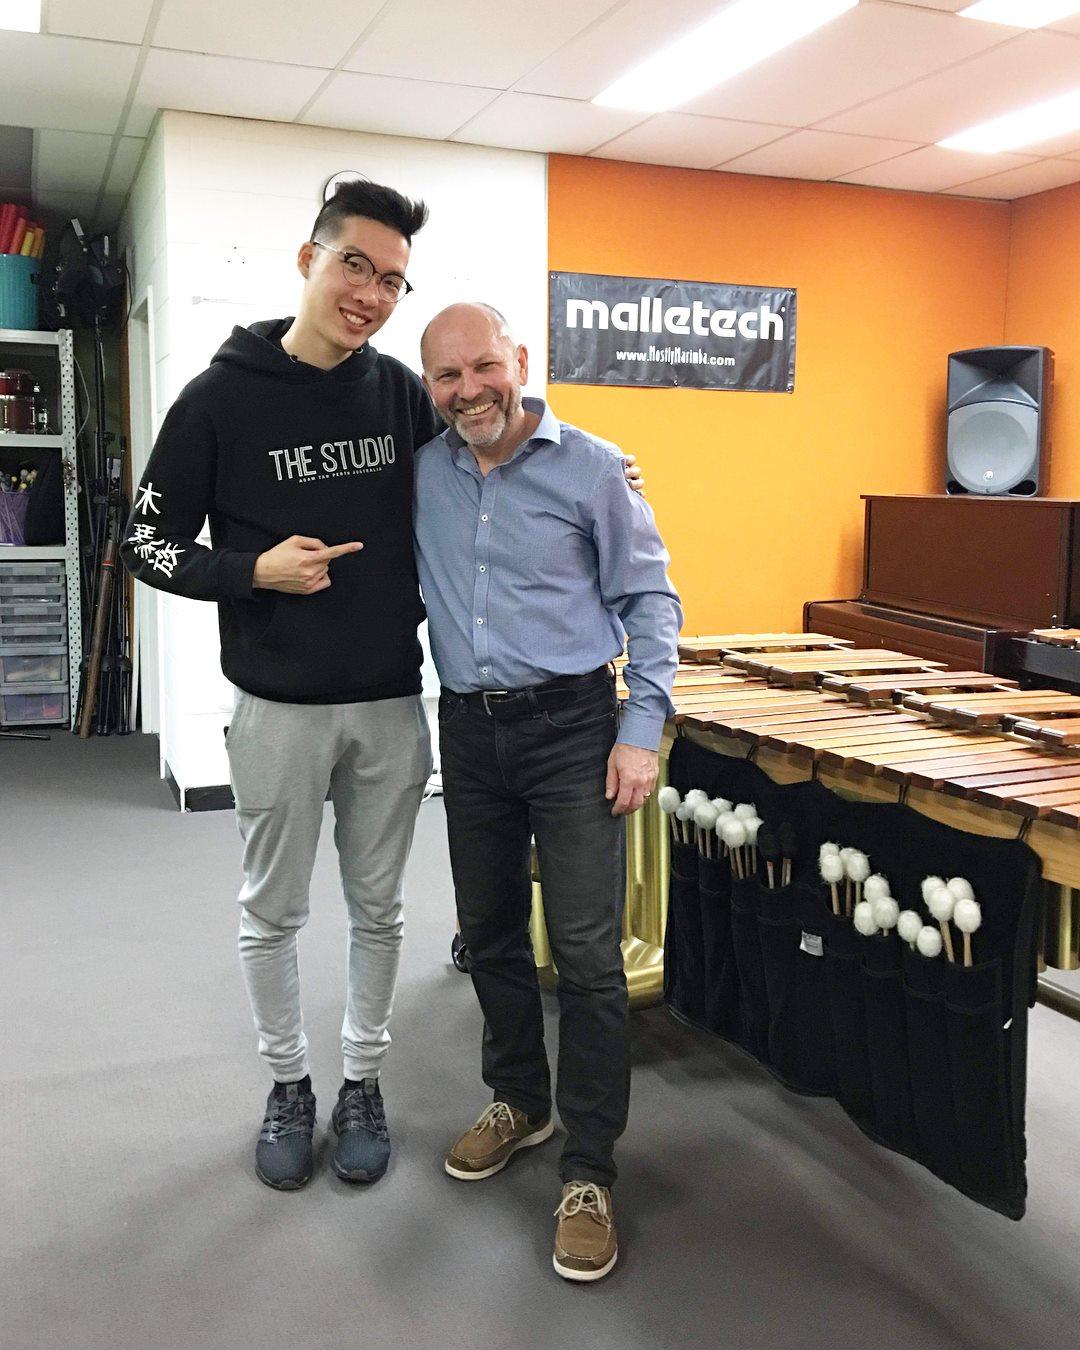 Meeting Sergei Golovko (again)